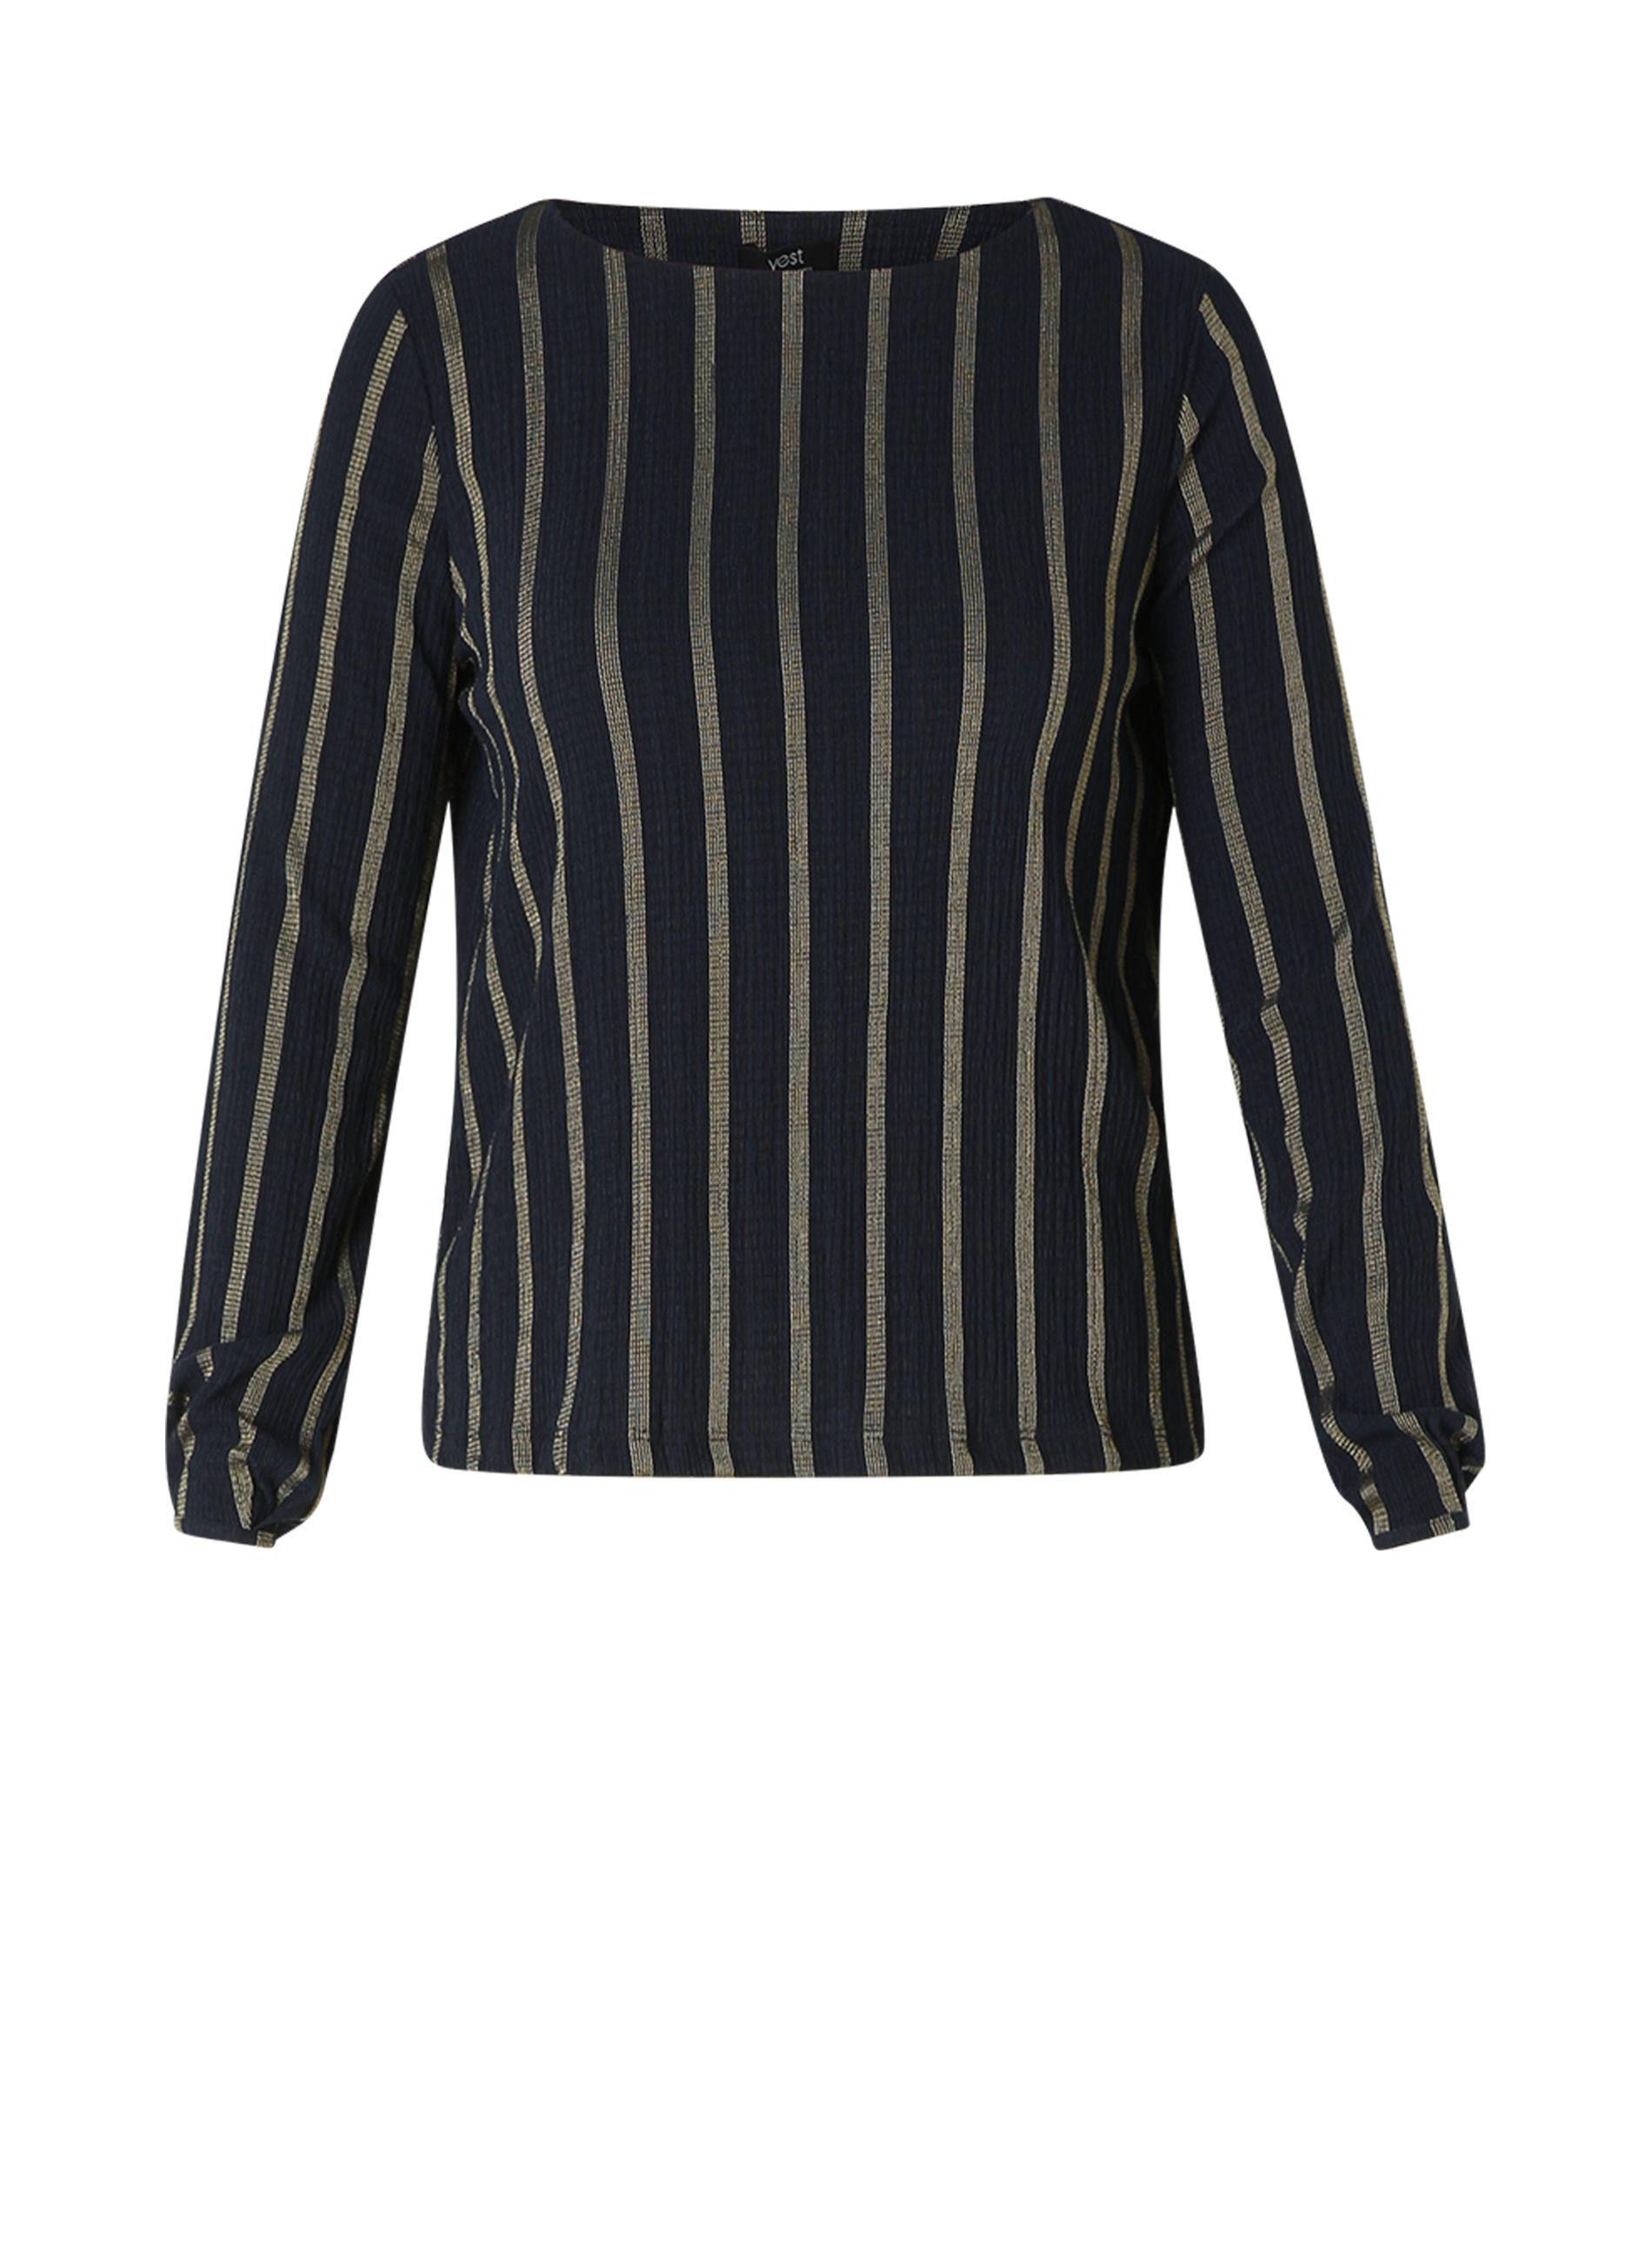 Sweater YESTA Daantje 74 cm